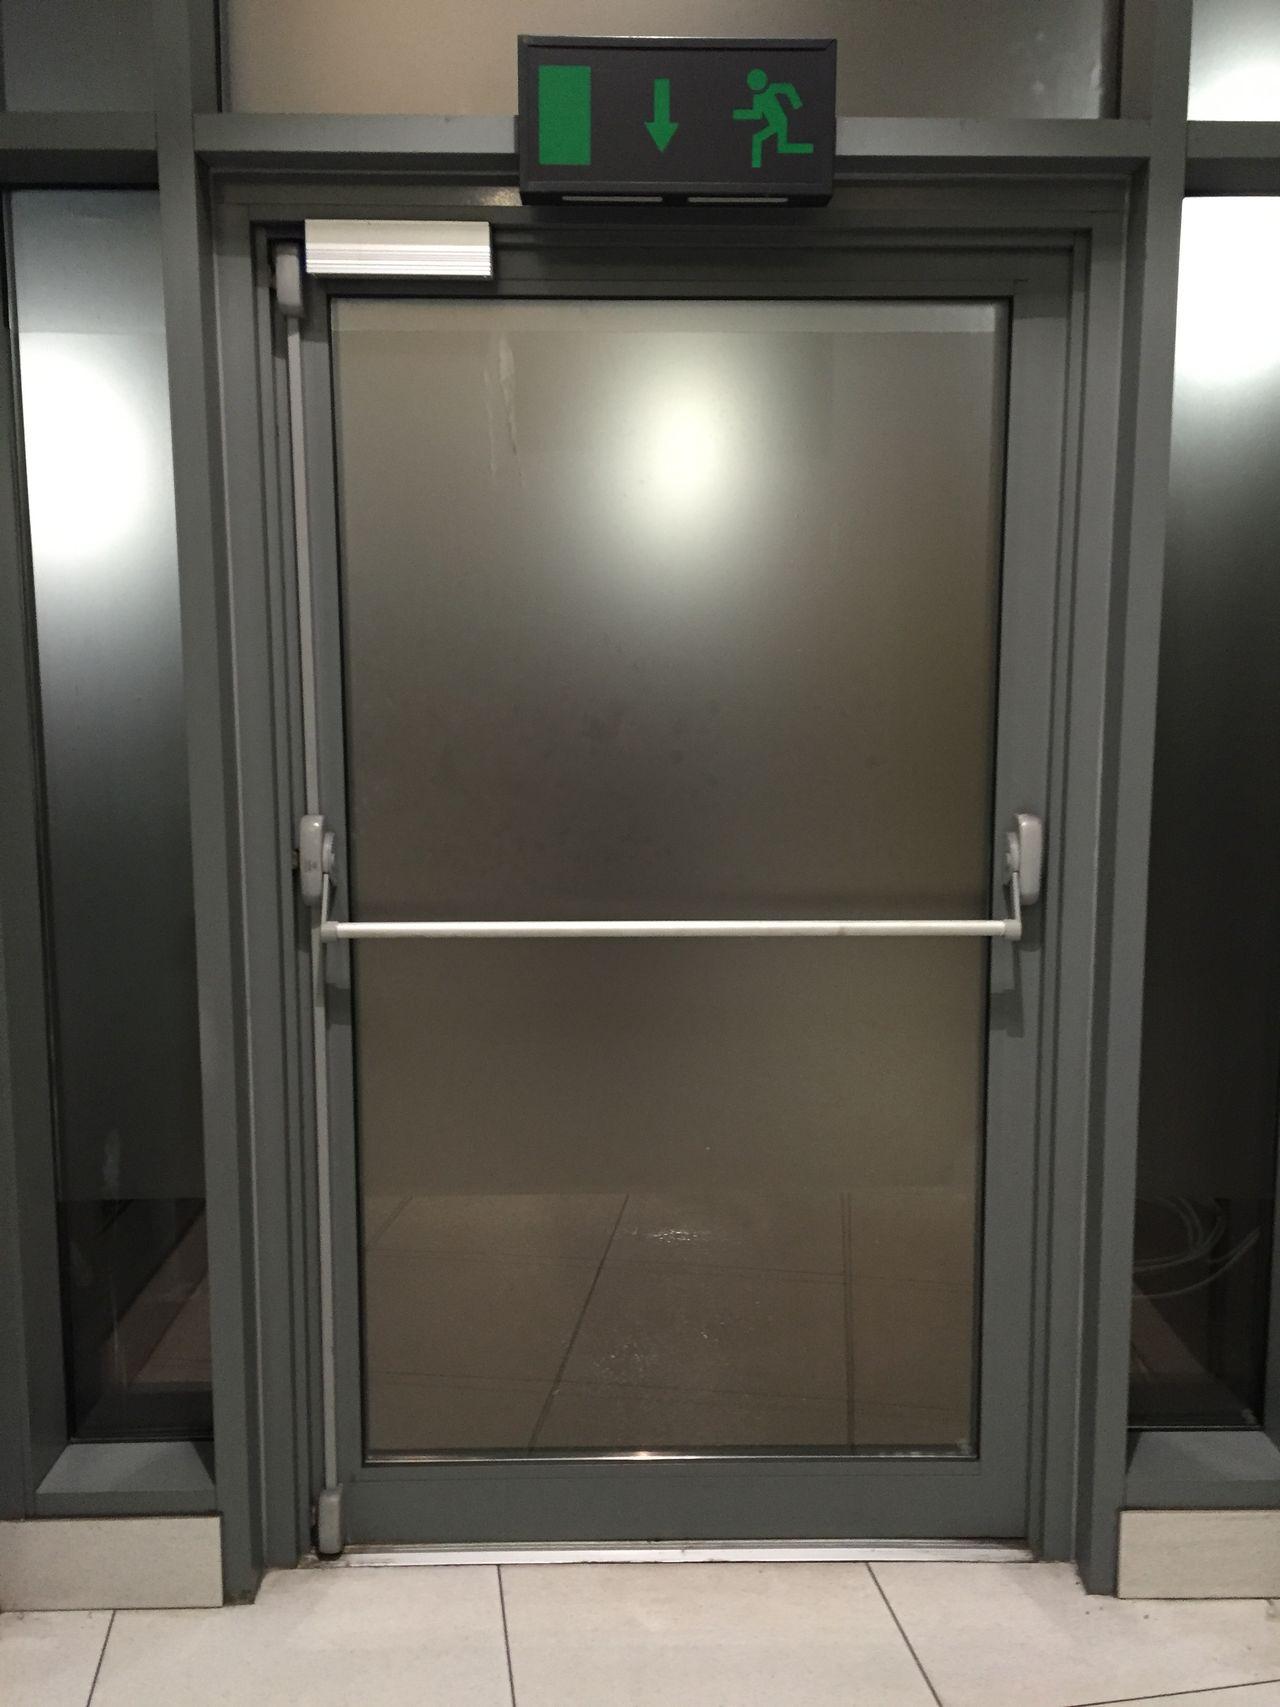 Fire Escape Fire Exit  Door Escape Window Windows Doorway Grey Gray Handle Bar Push Push To Open